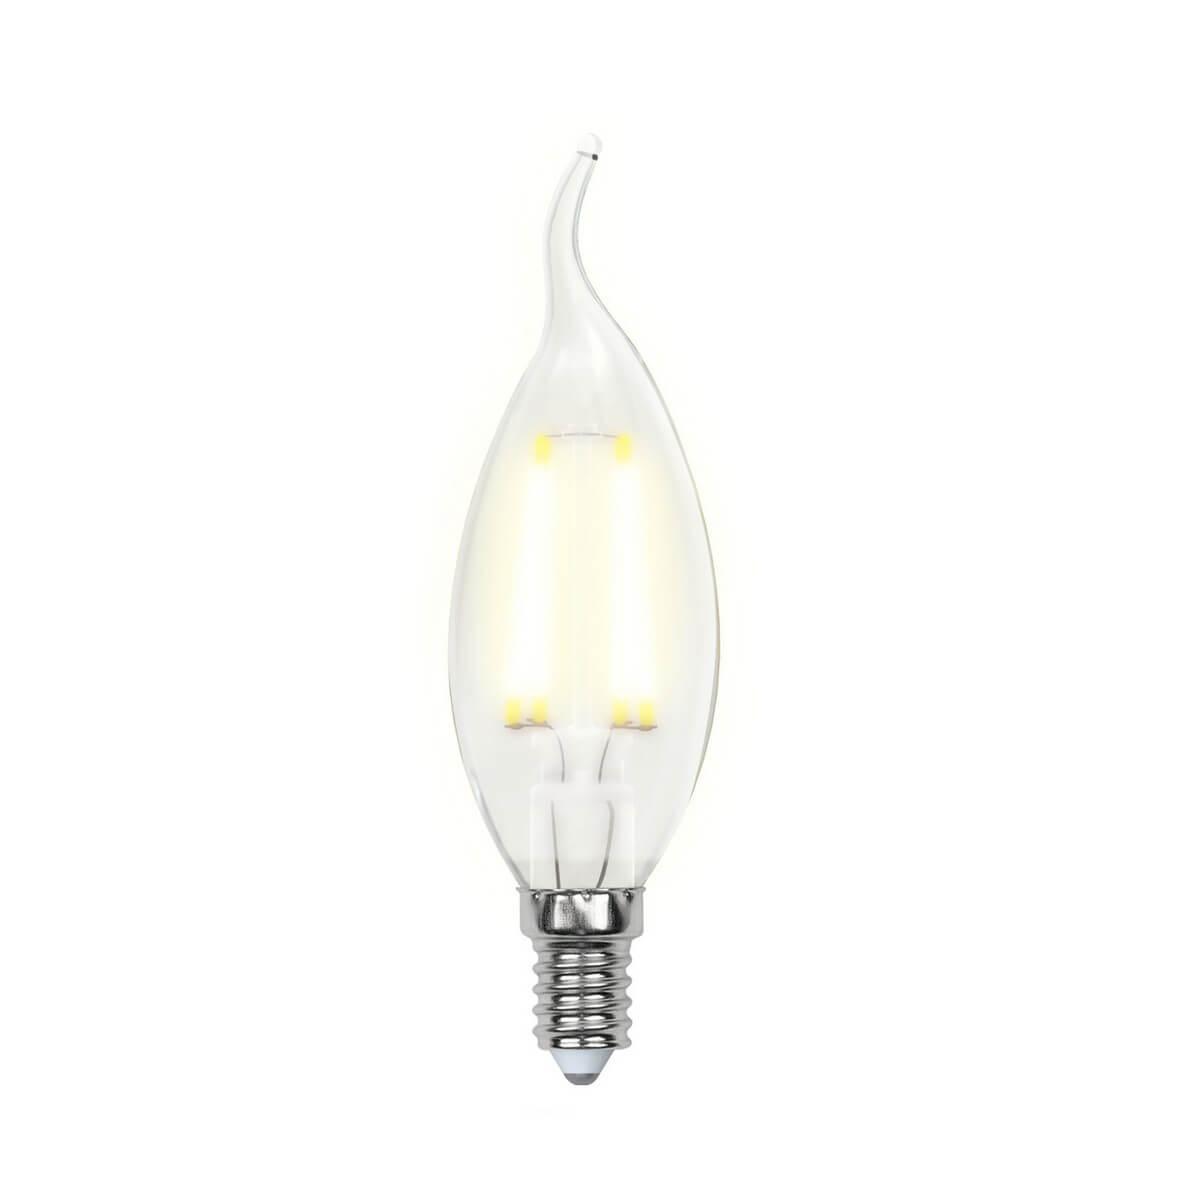 Лампочка Uniel LED-CW35-5W/WW/E14/CL/DIM GLA01TR AIR DIM